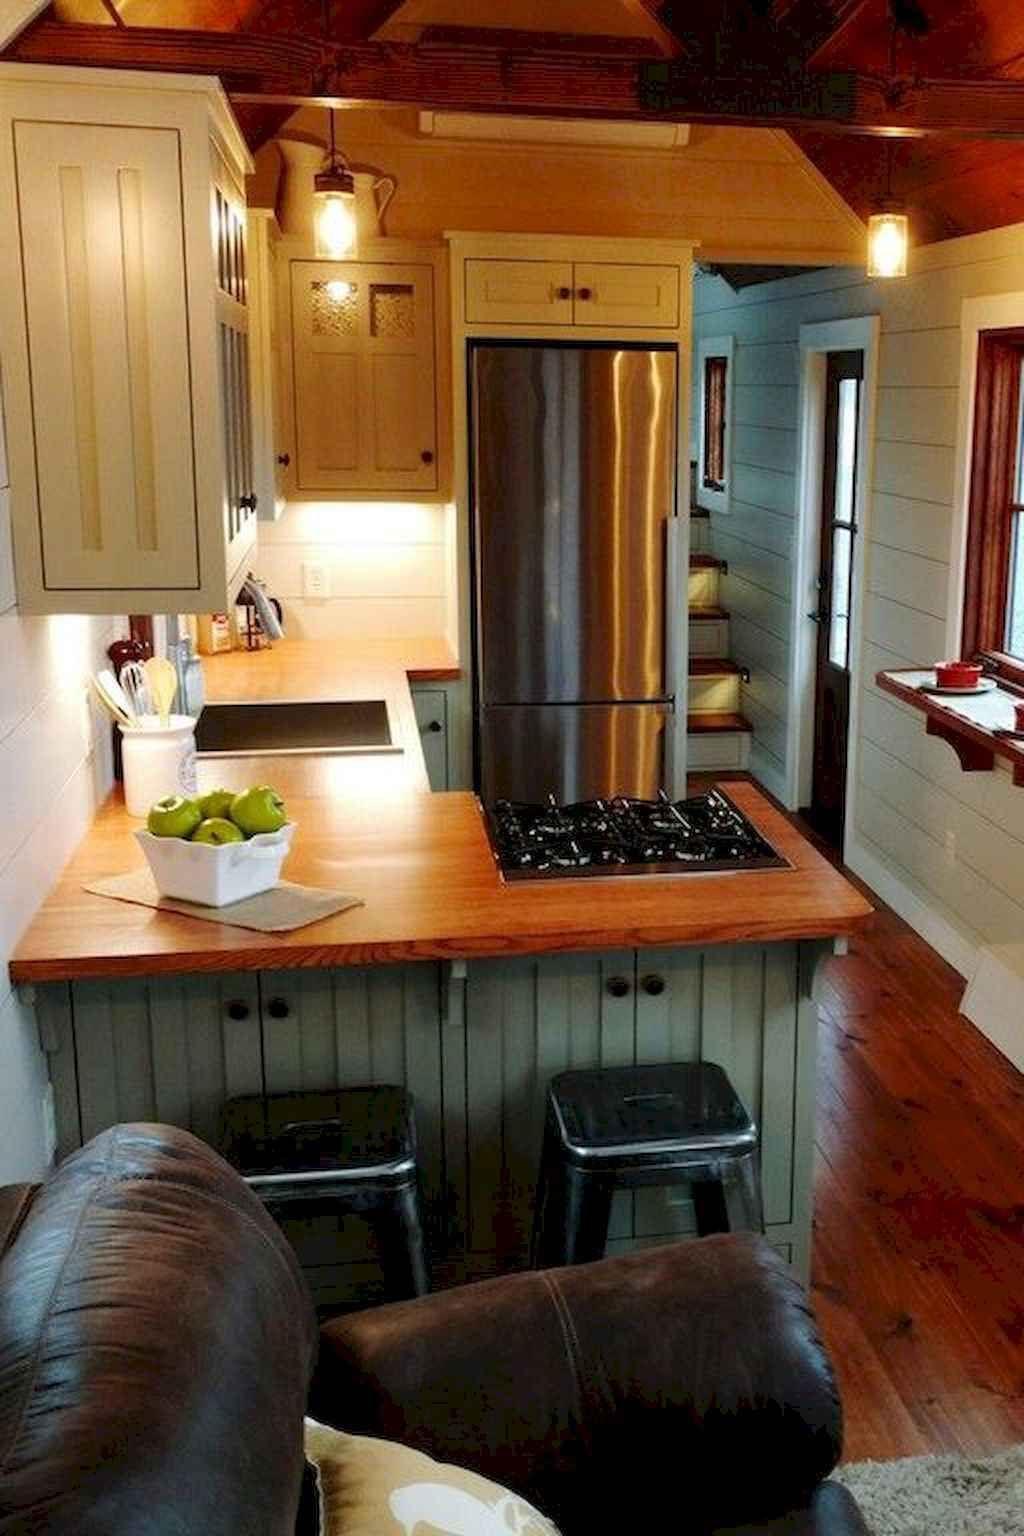 70 Tiny House Kitchen Design Ideas Tiny Kitchen Design Tiny House Kitchen House Design Kitchen